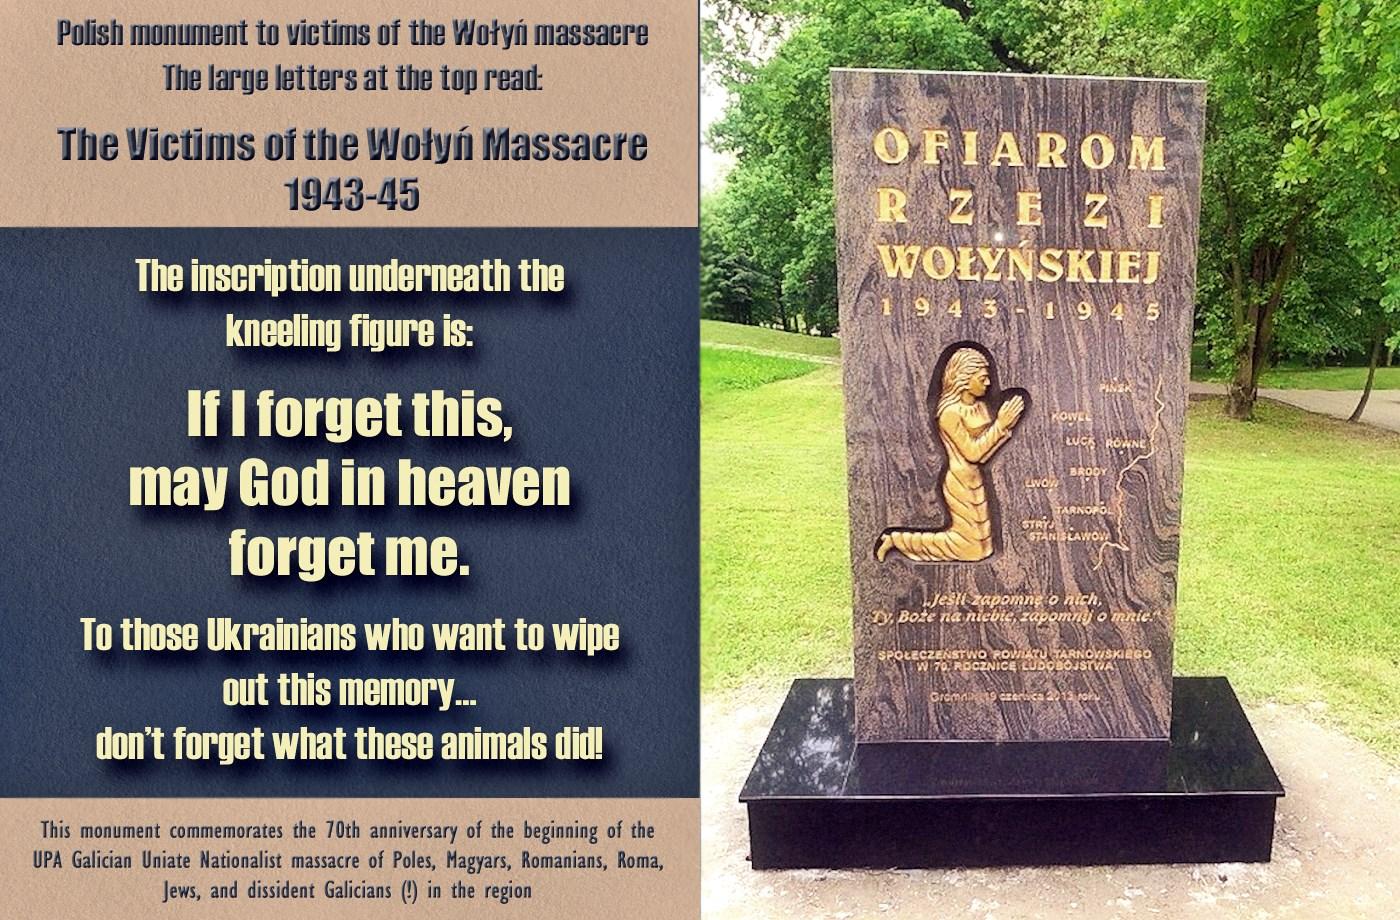 00 polish memorial volyn massacre. 280715